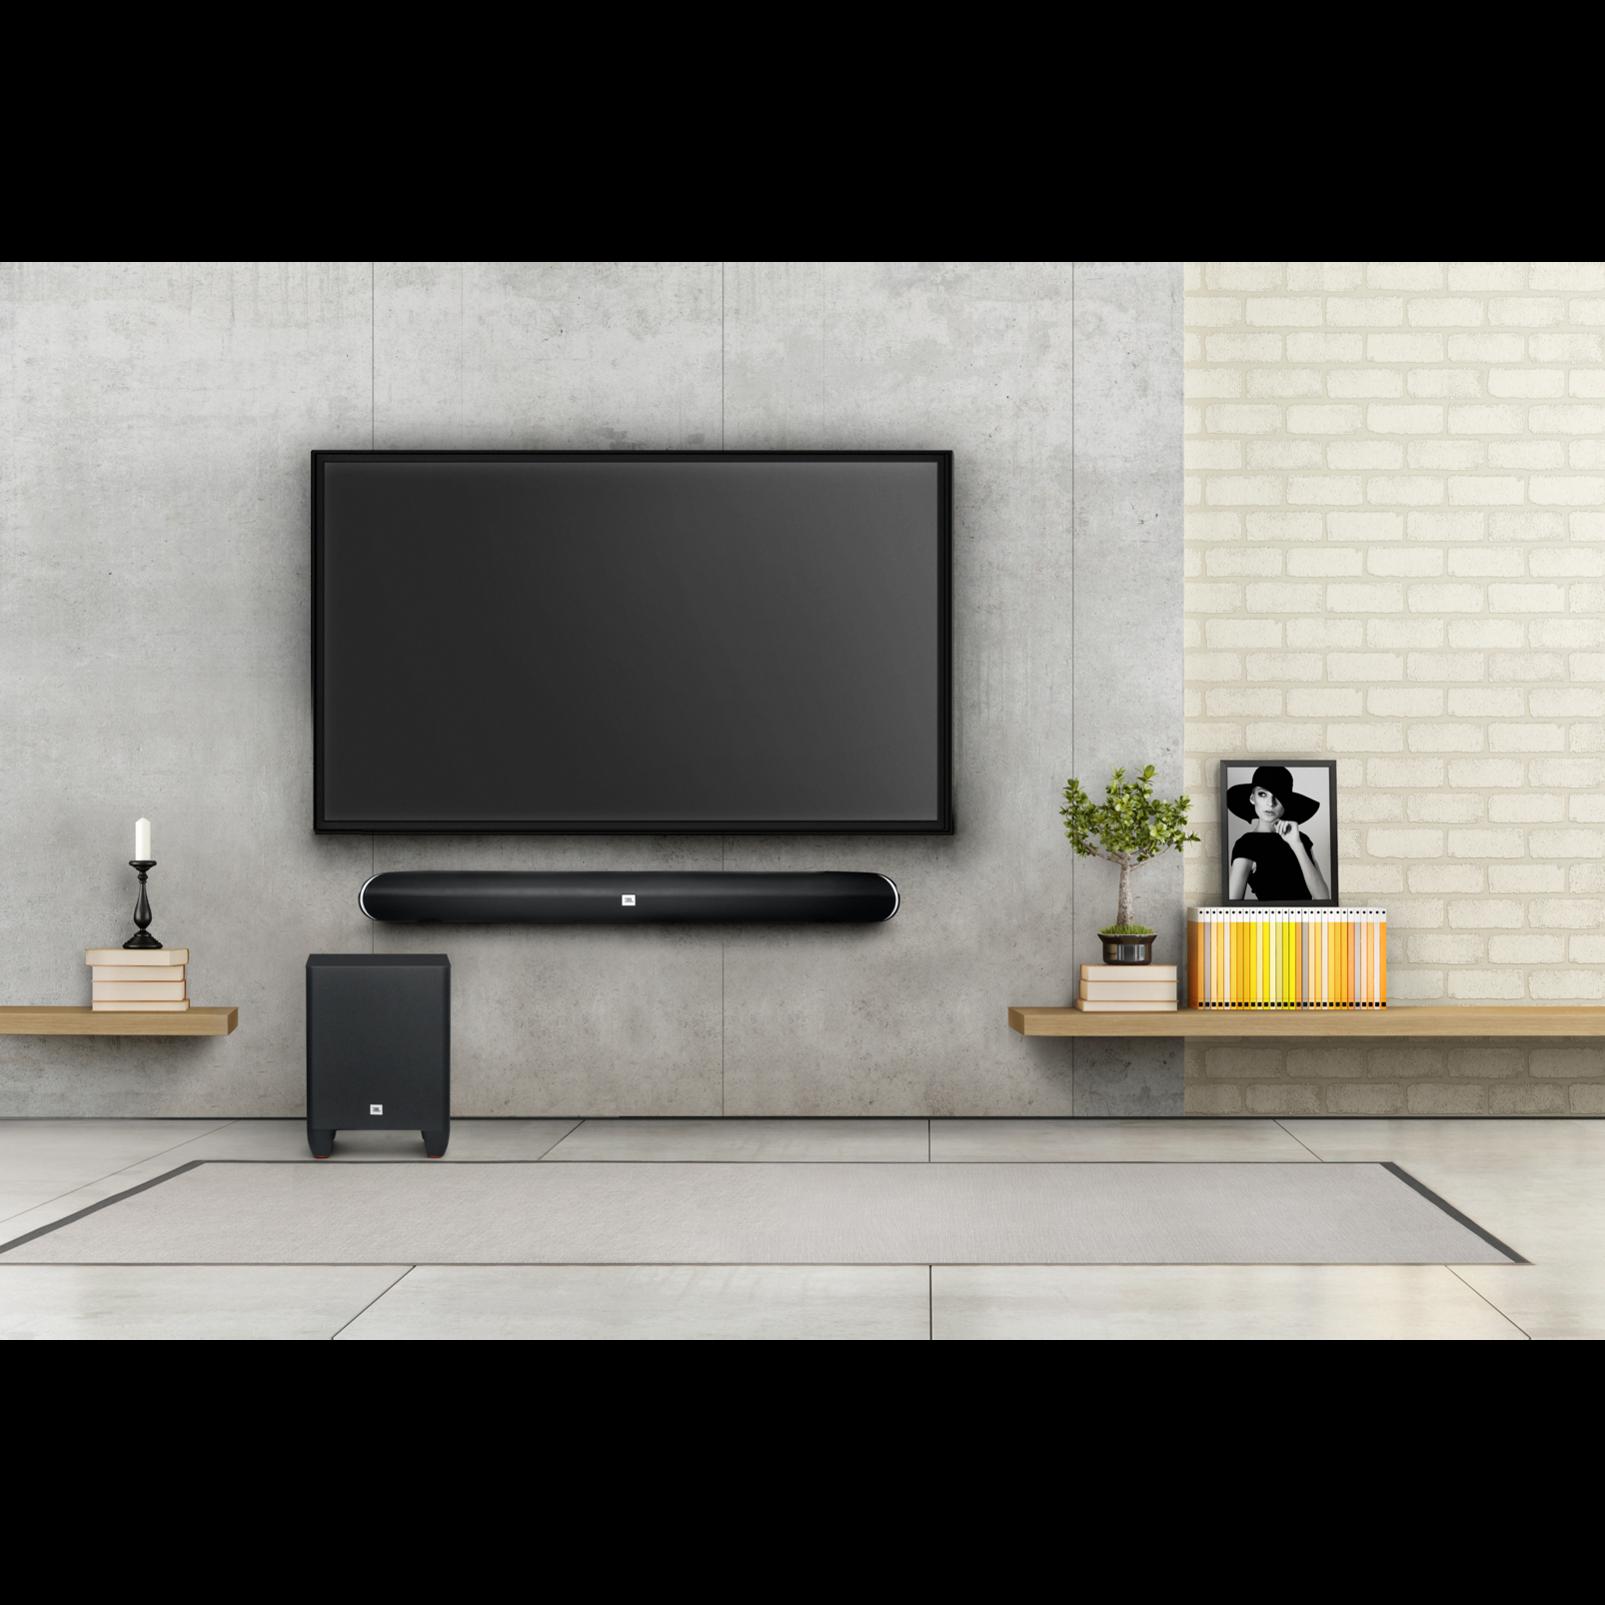 cinema sb250 200w home cinema soundbar with wireless subwoofer and virtual surround. Black Bedroom Furniture Sets. Home Design Ideas